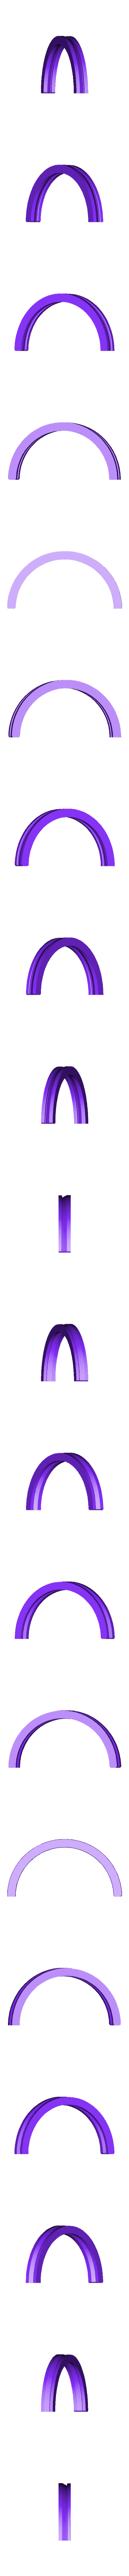 LM_accroche.stl Download STL file Luminaires • Design to 3D print, Barbe_Iturique